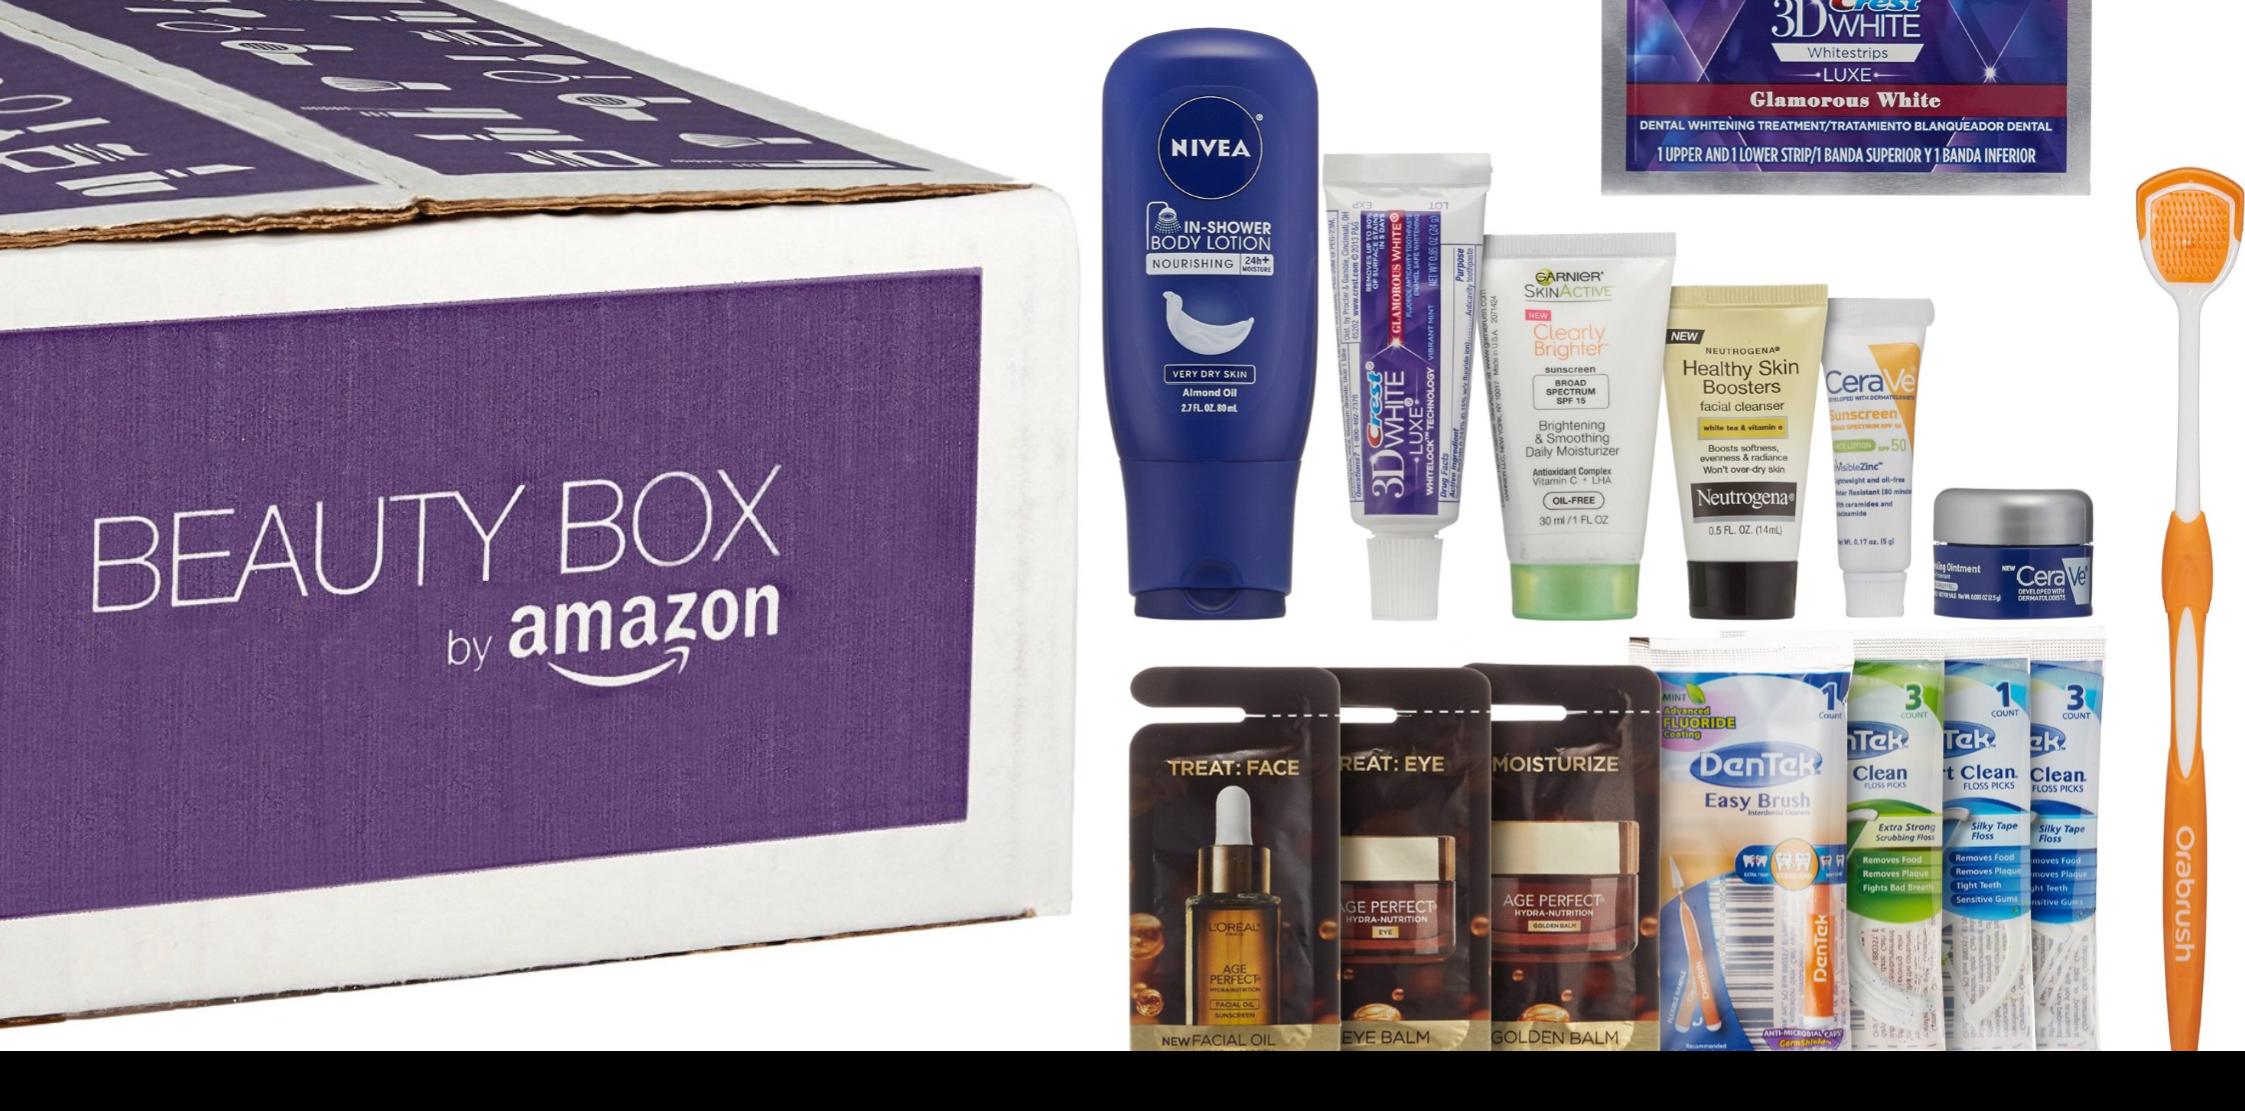 amazon beauty box sample